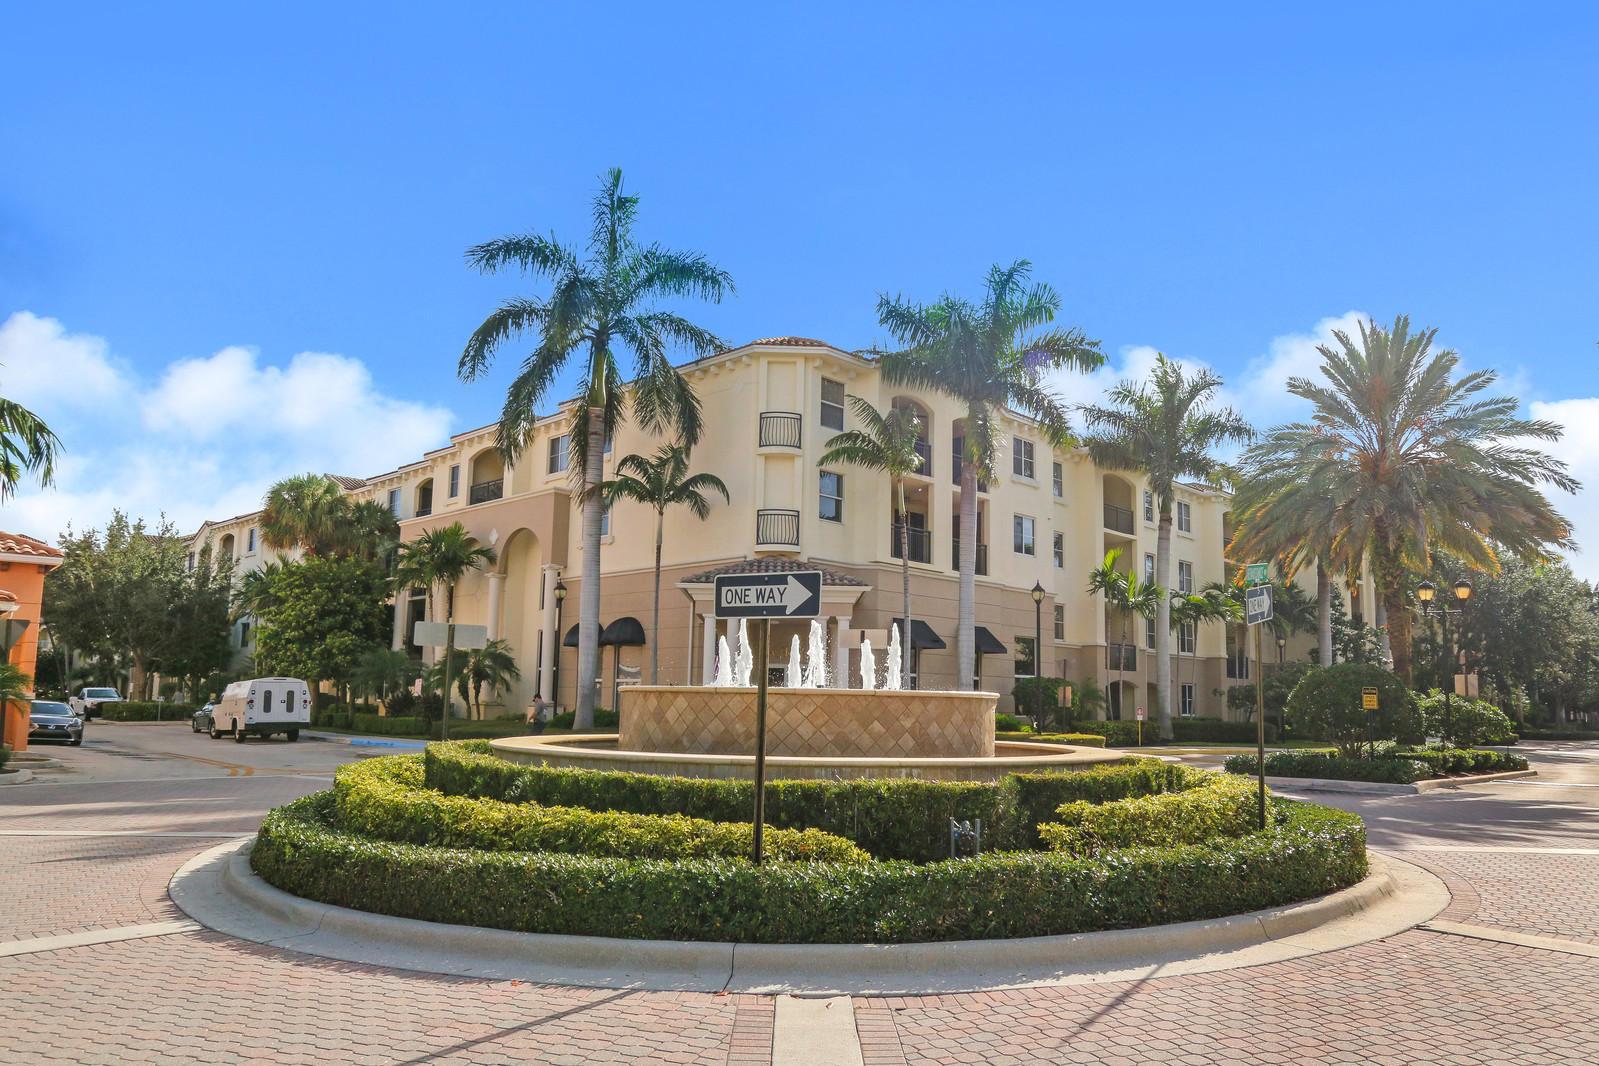 1416 Renaissance Way 416 Boynton Beach, FL 33426